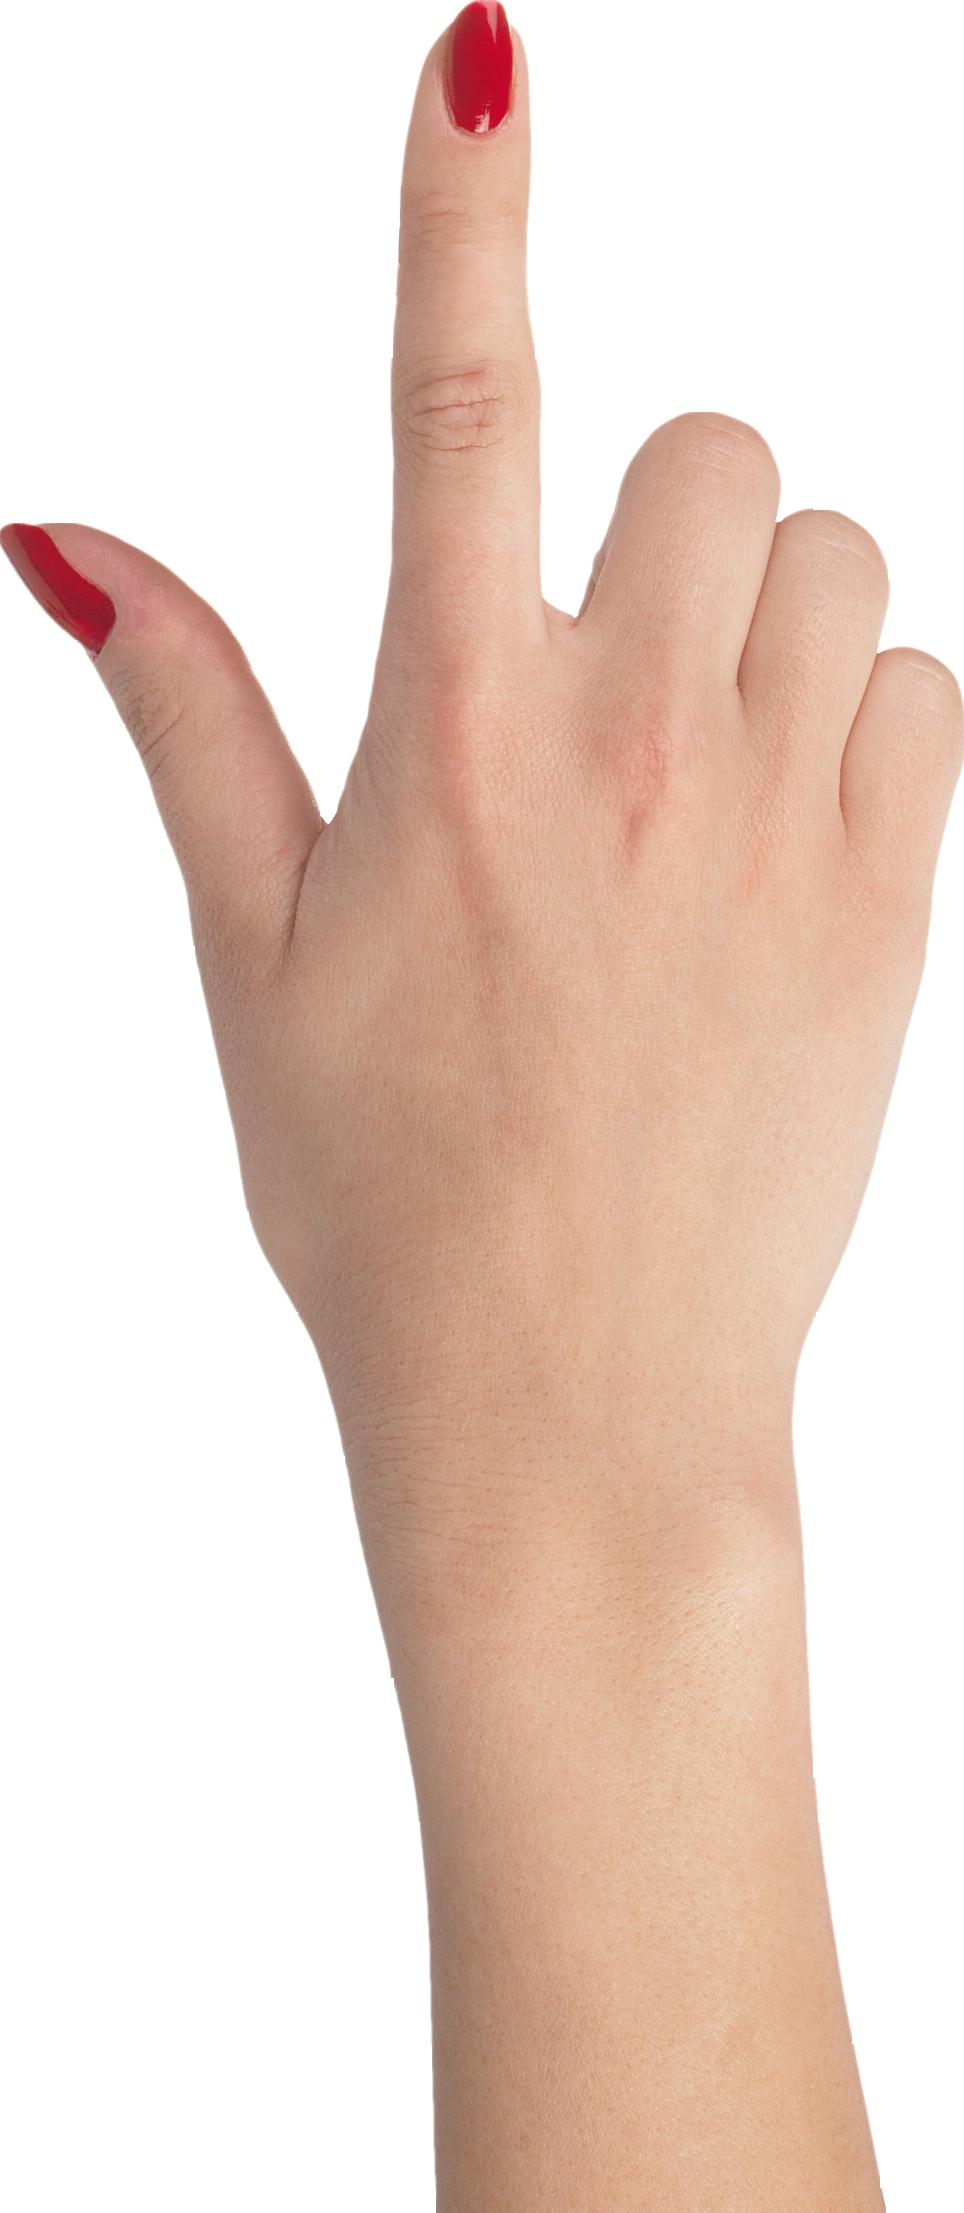 Fingers Png Images Free Download Finger Png Here you can download free png images on theme: fingers png images free download